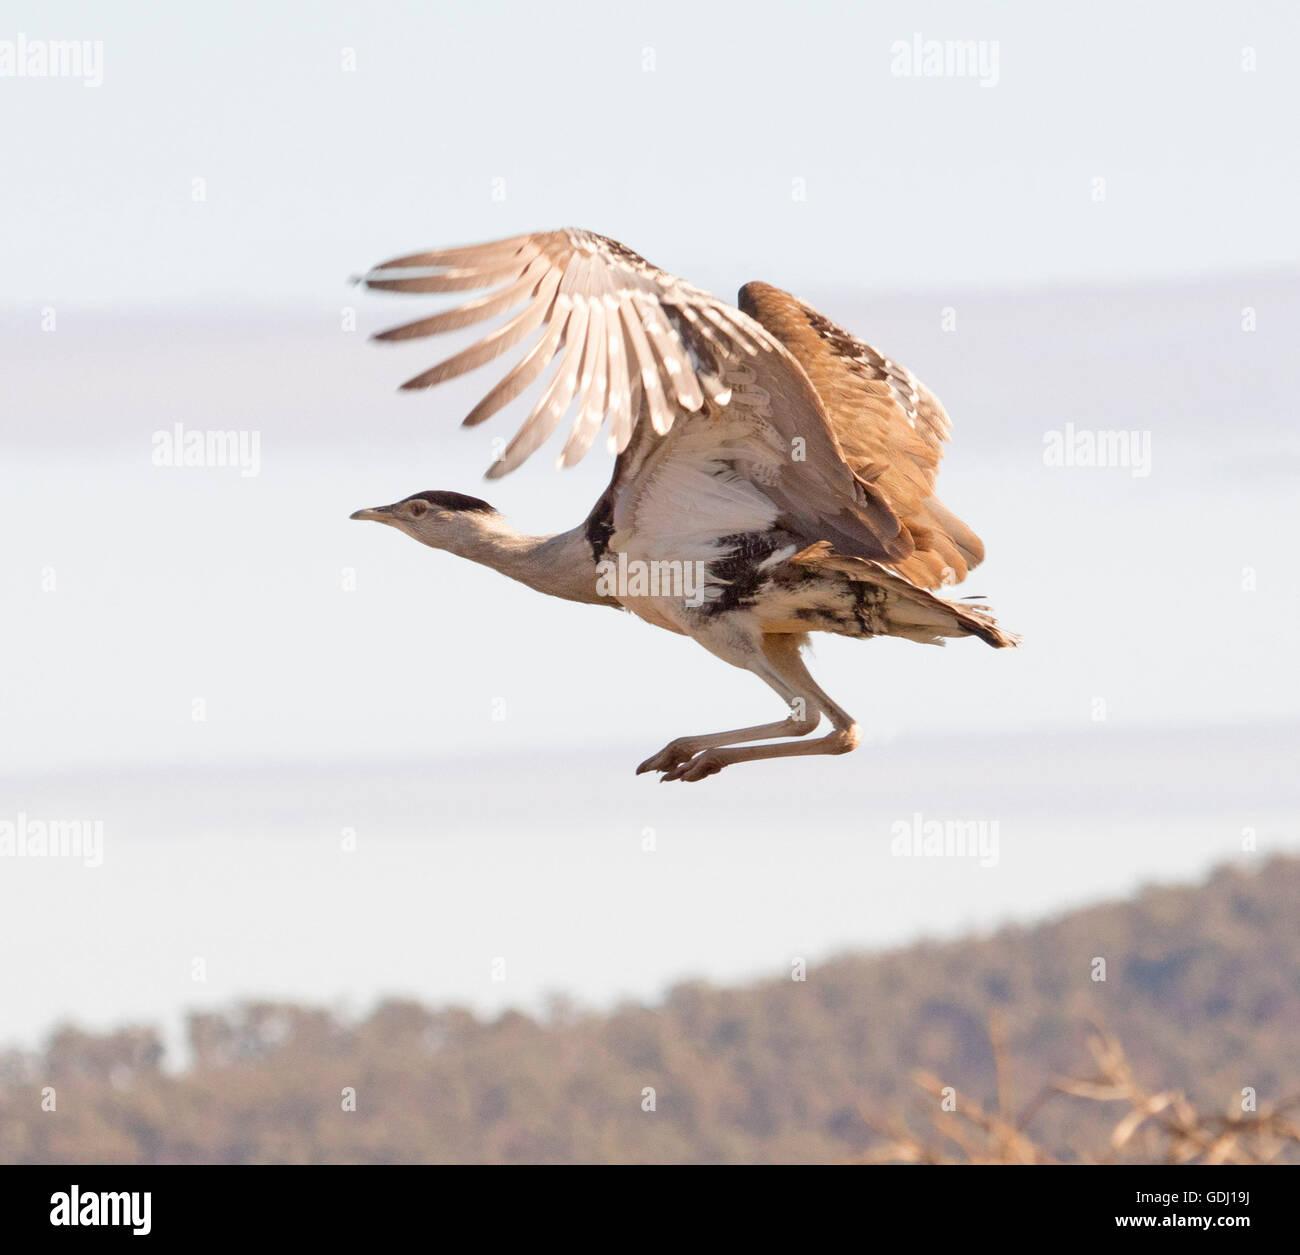 Australian bustard / plains turkey Ardeotis australis, large brown bird in flight over grasslands of outback Australia - Stock Image